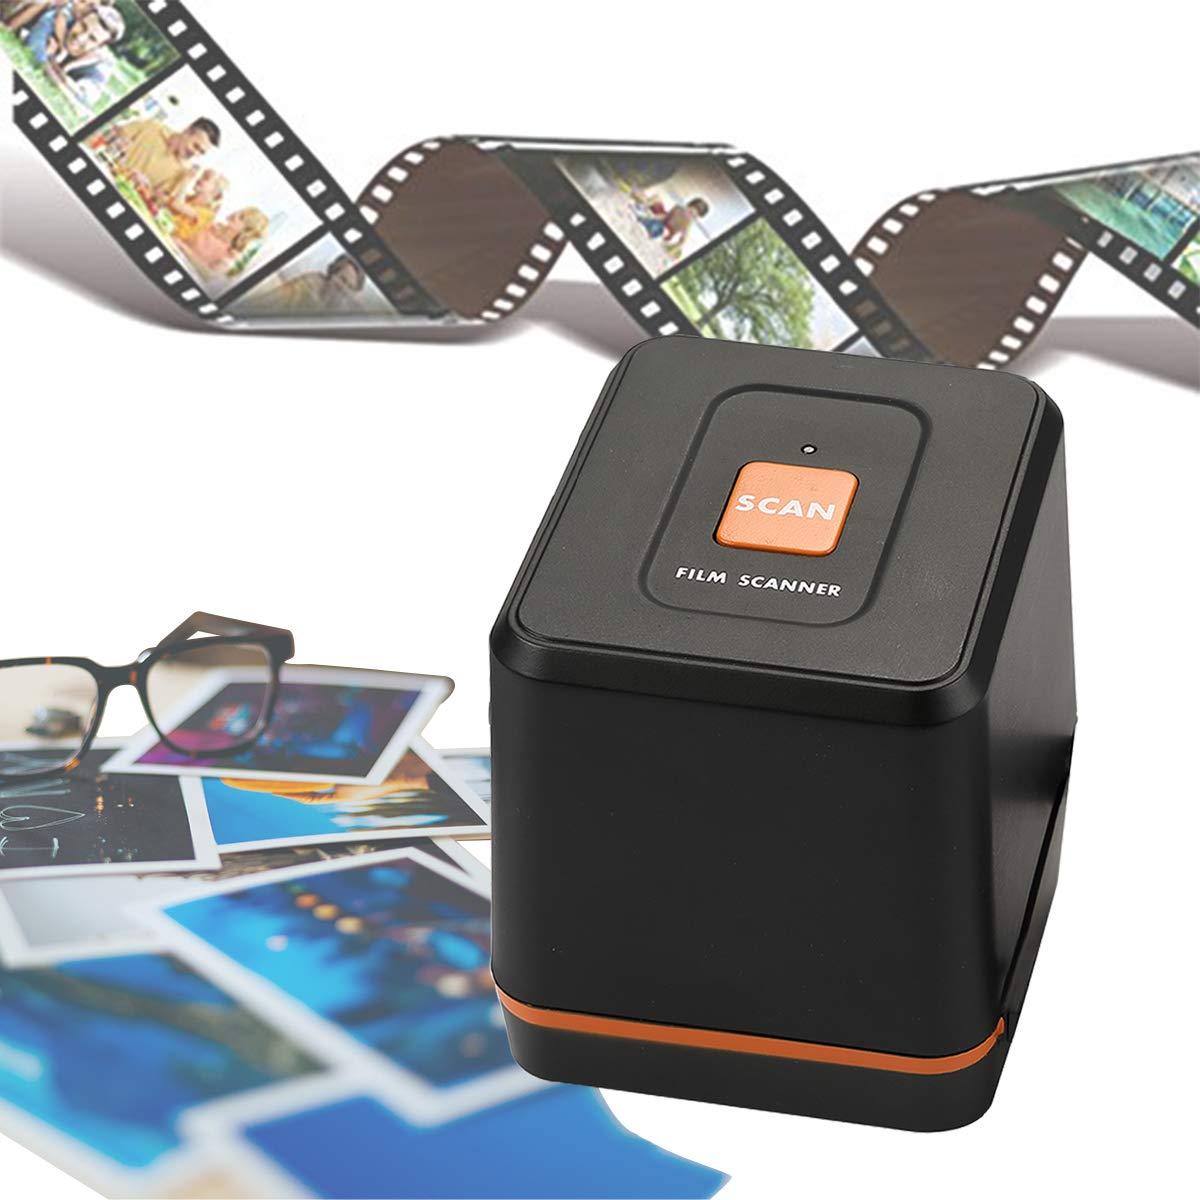 [2019 Updated ]Digital Film & Slide Scanner Converter - Convert 35mm 126 Film Negatives & Slides to HD Digital JPEG Photos (1800 or 3600dpi), Easy Load Film Insert, Support Windows & Mac OS Computers by BlazeVideo